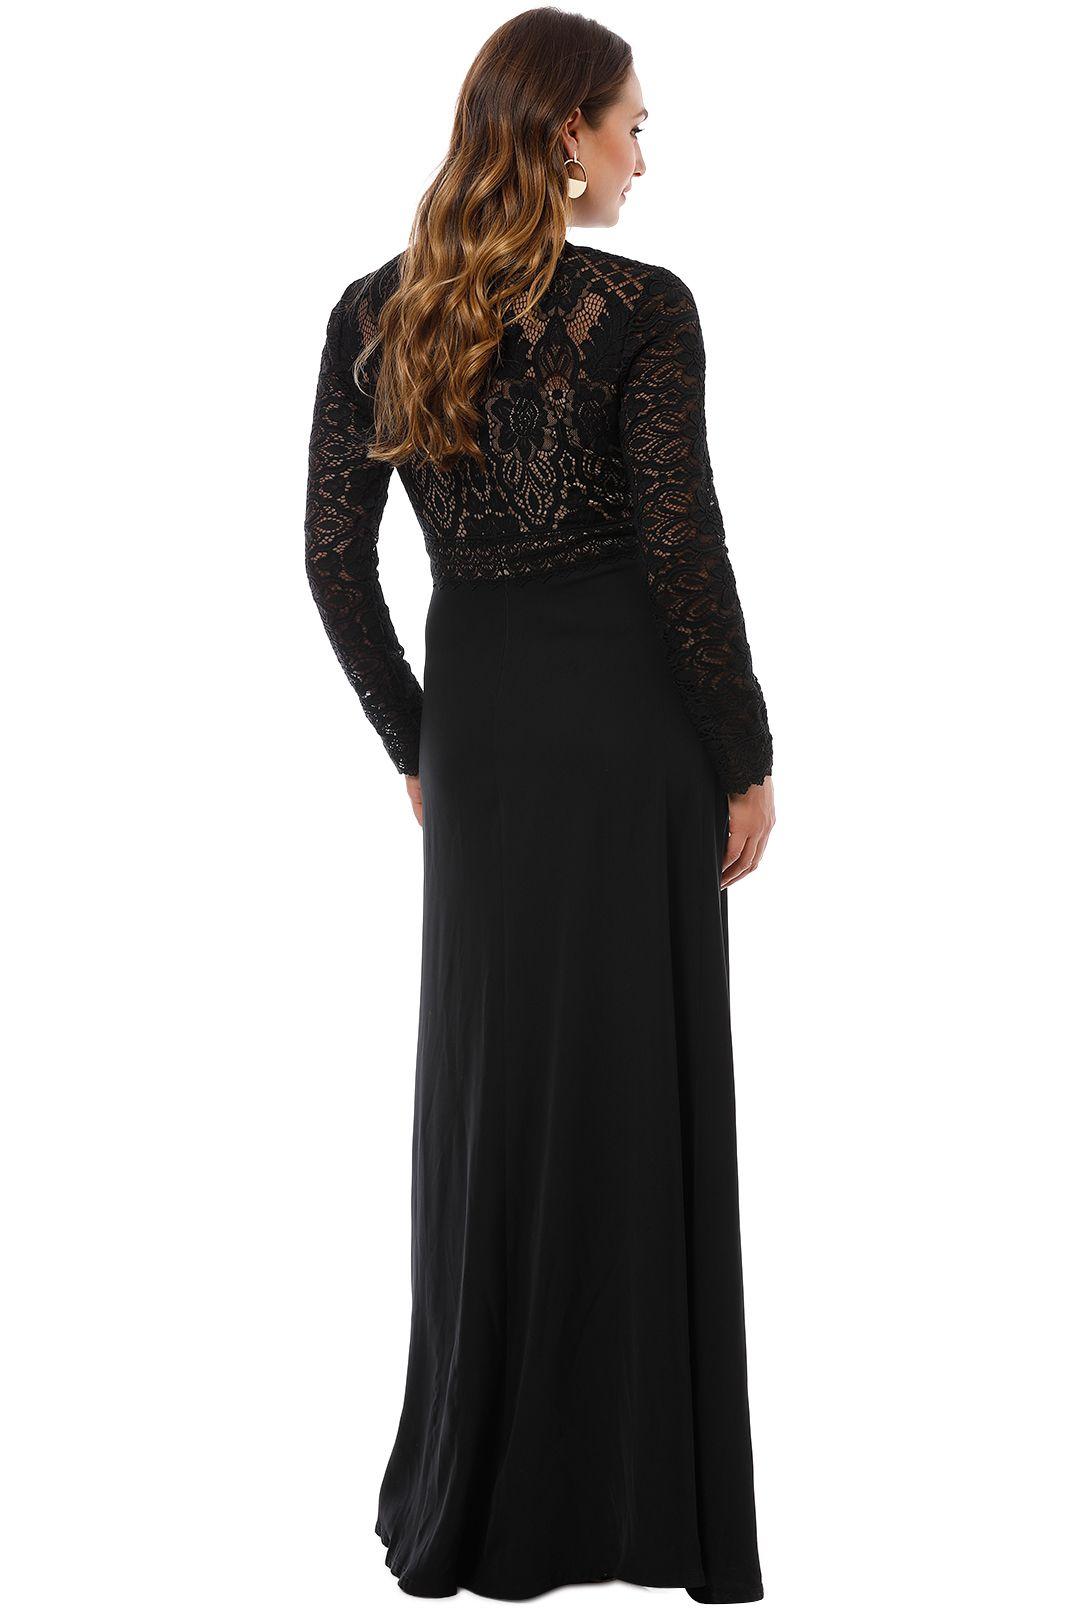 Tadashi Shoji - Benes Long Sleeve Gown - Black - Back